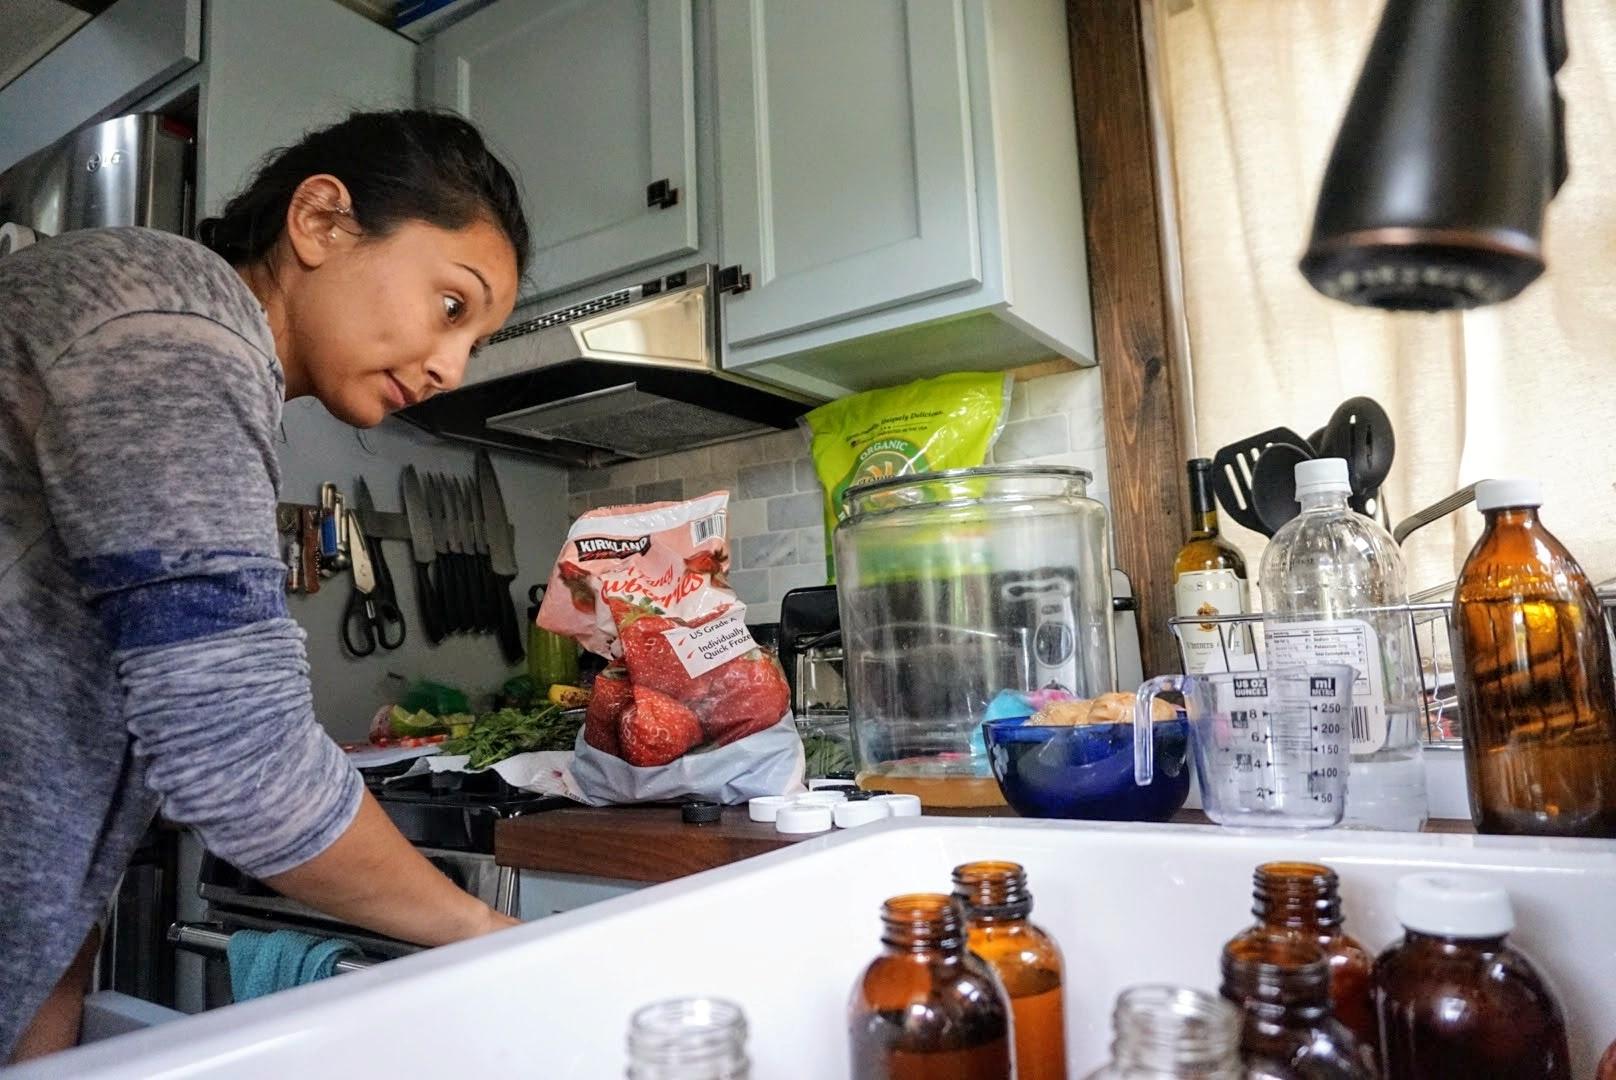 Tiny Home living Kombucha Brewing Scoby bottling homemade organic flavors fruit original small batch